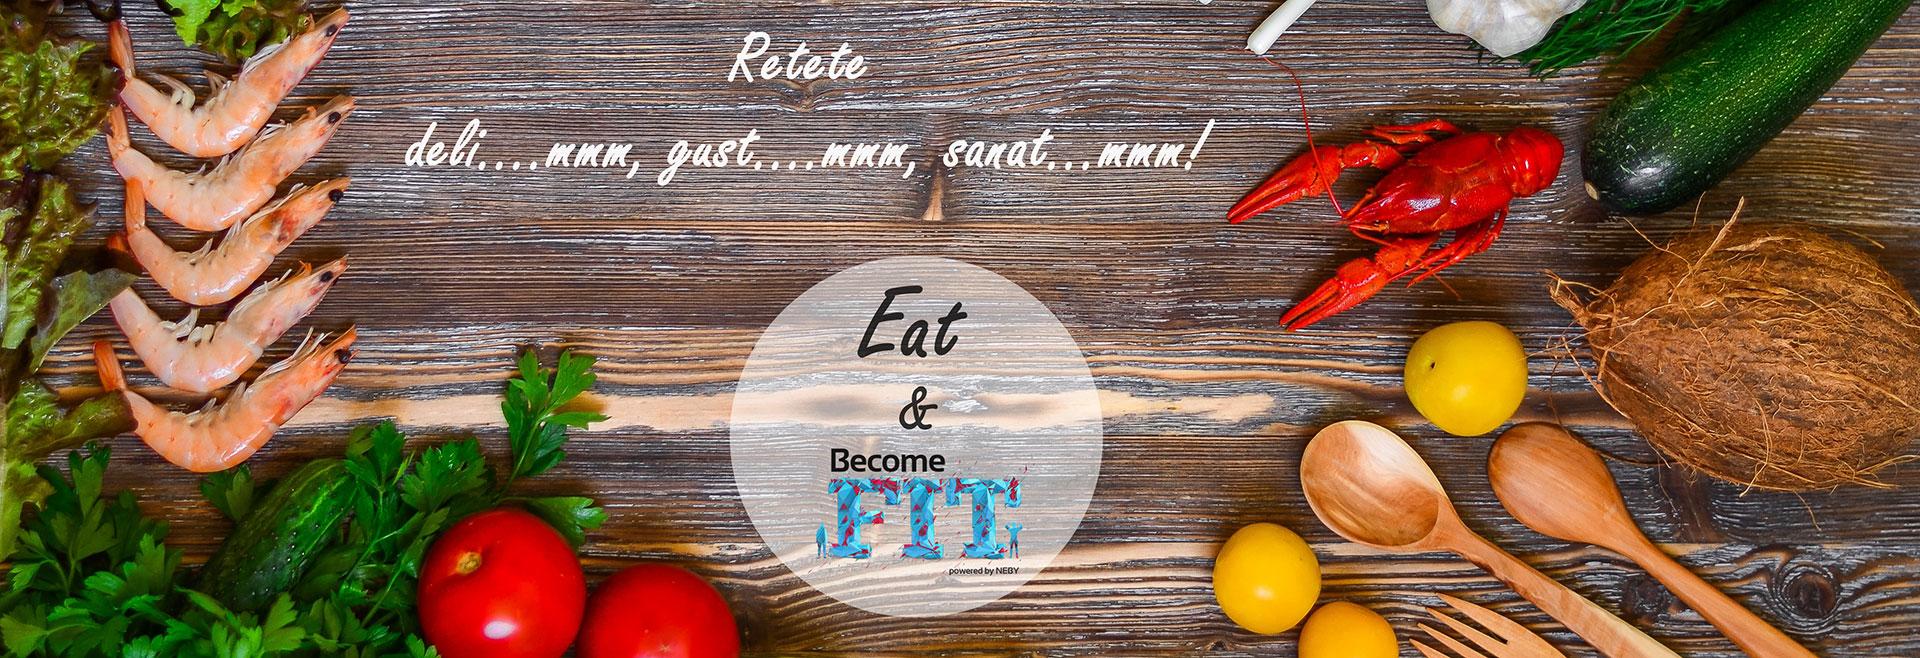 eat-becomefit